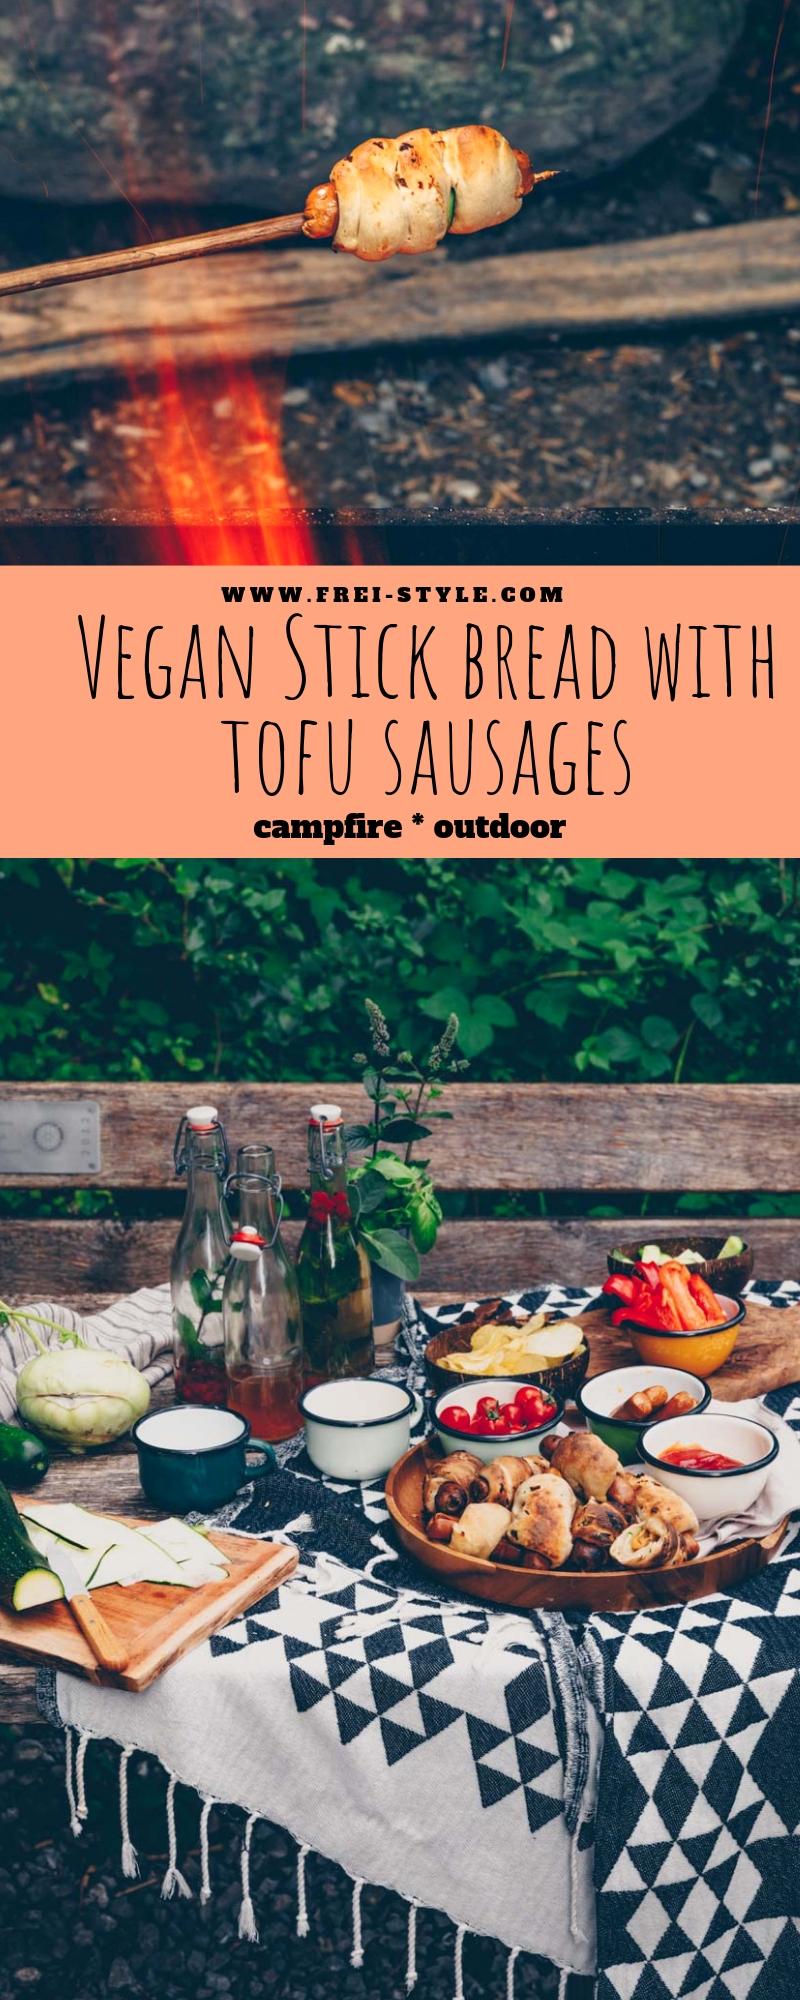 Vegan stick bread with tofu sausages